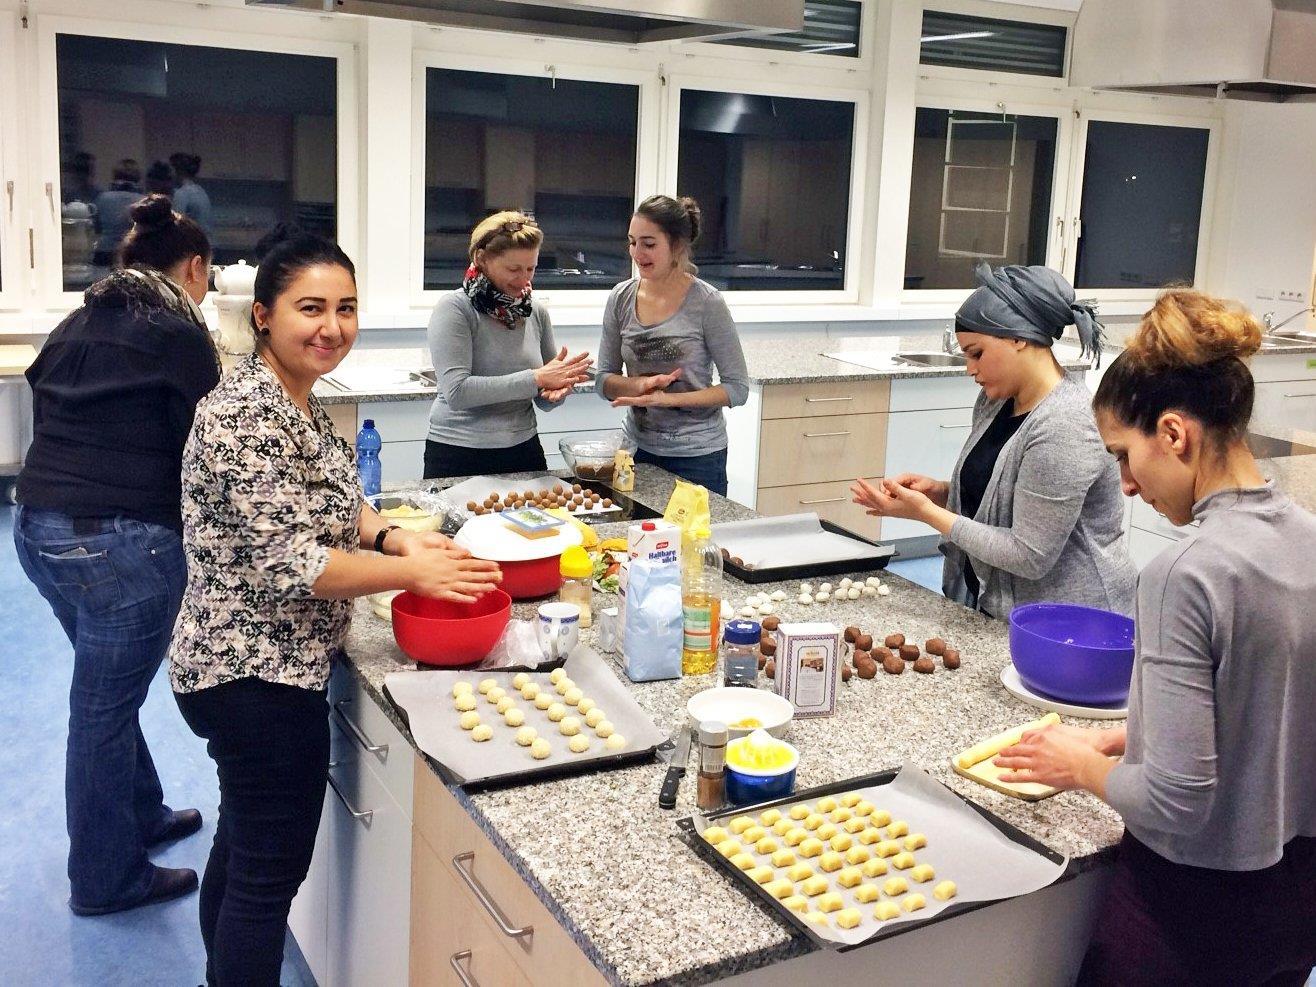 Interkultureller Austausch beim gemeinsamen Kekse backen